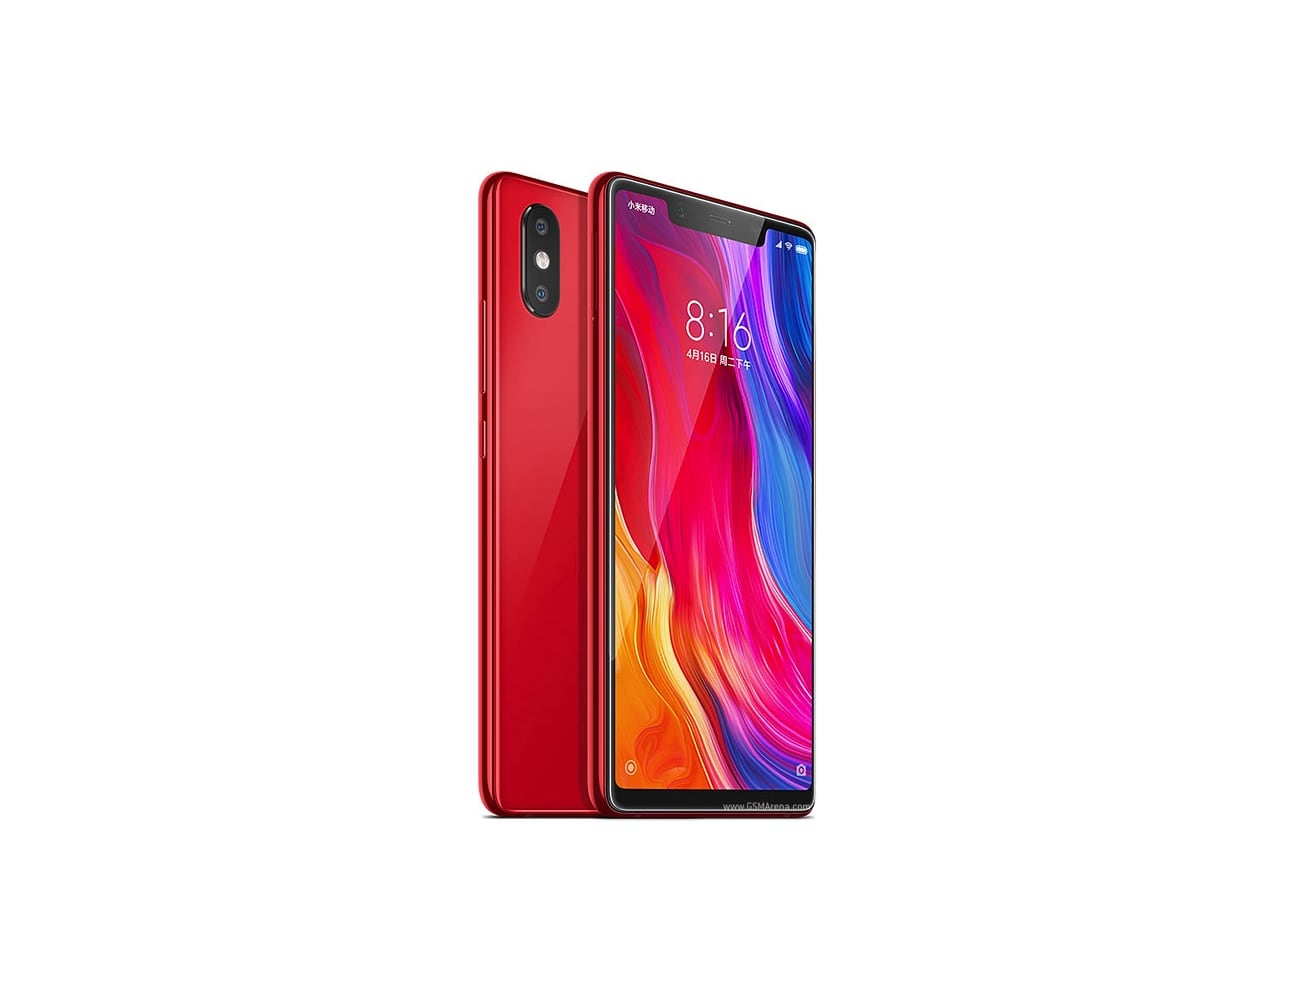 Xiaomi Mi 8 SE Snapdragon 710 Smartphone